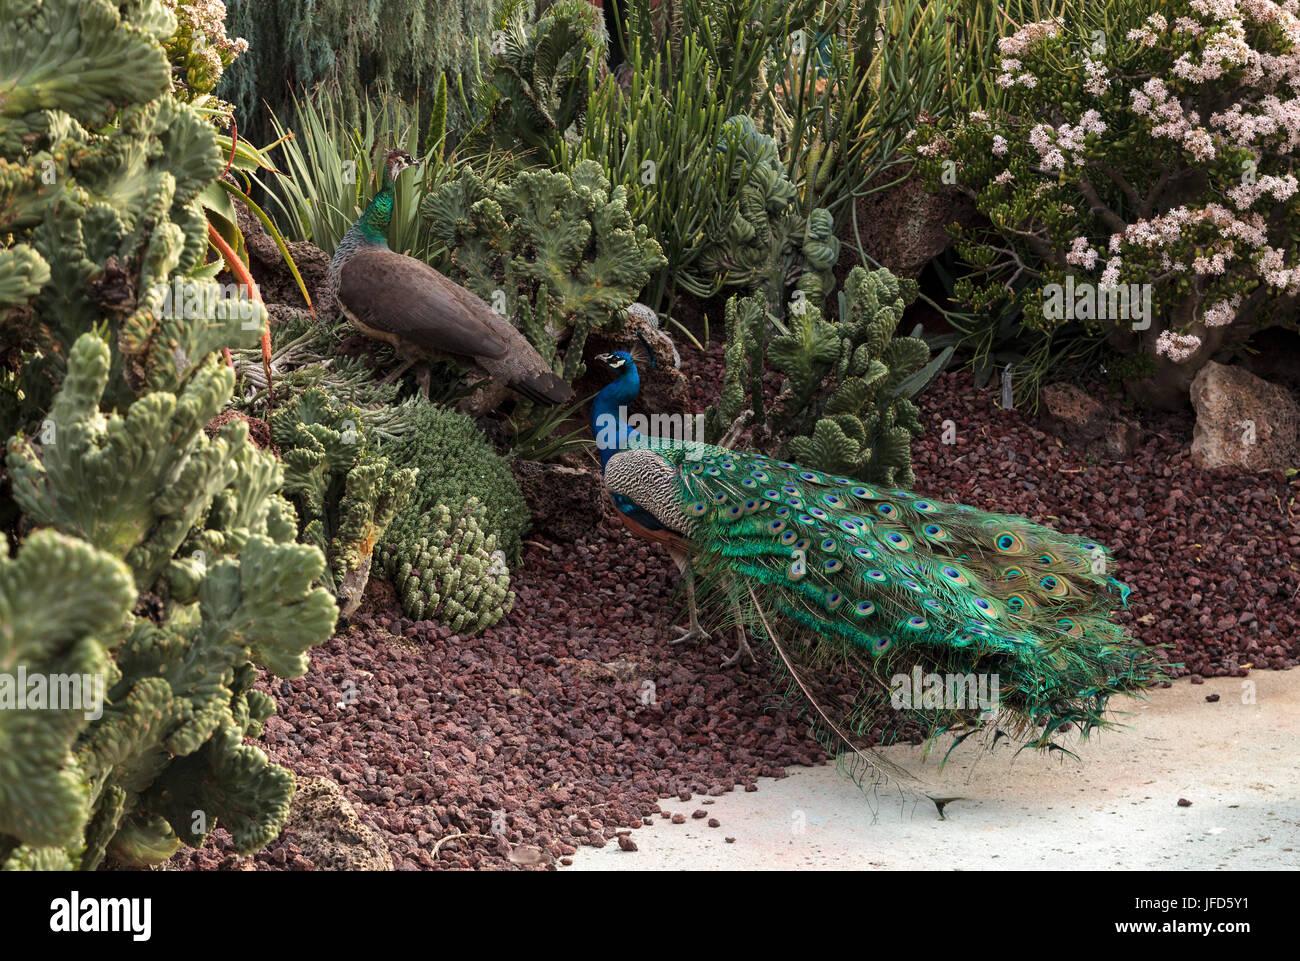 male peacock Pavo muticus - Stock Image